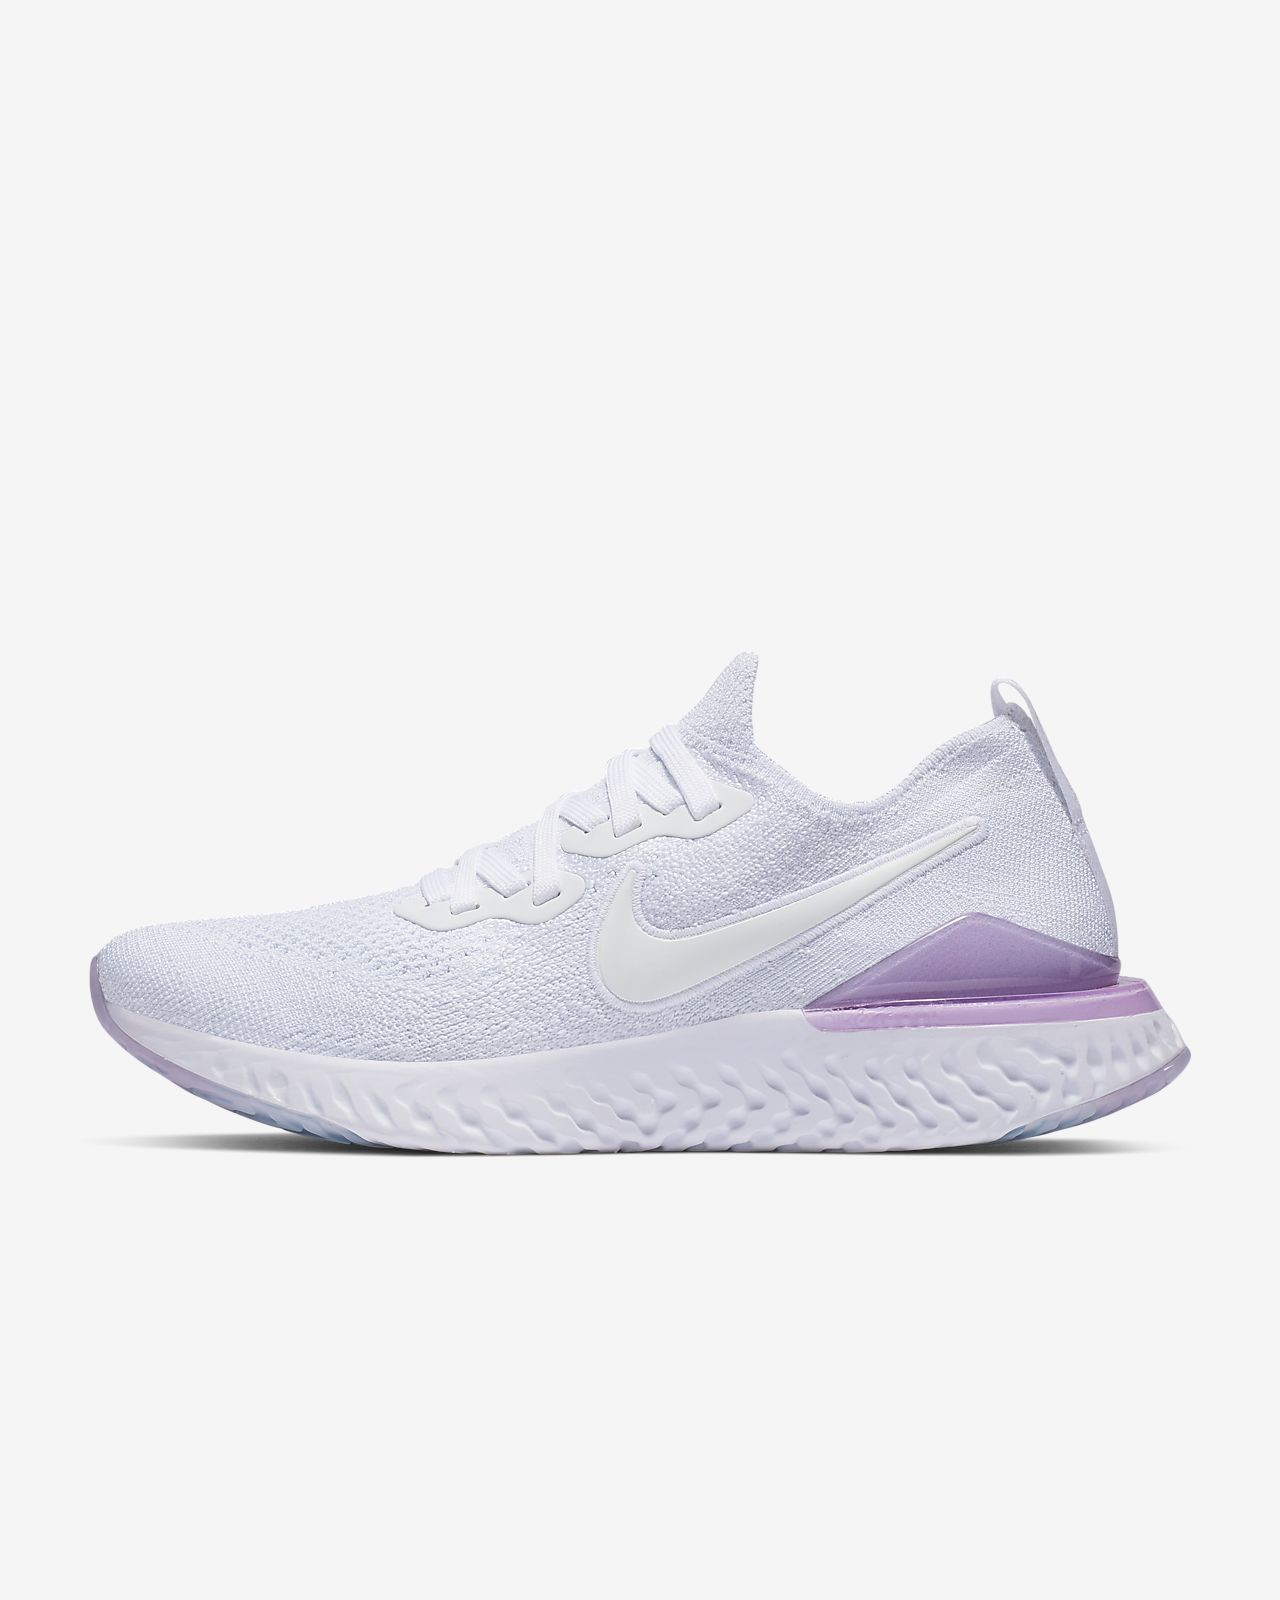 d6d941c7d4c66 Nike Epic React Flyknit 2 Zapatillas de running - Mujer. Nike.com ES